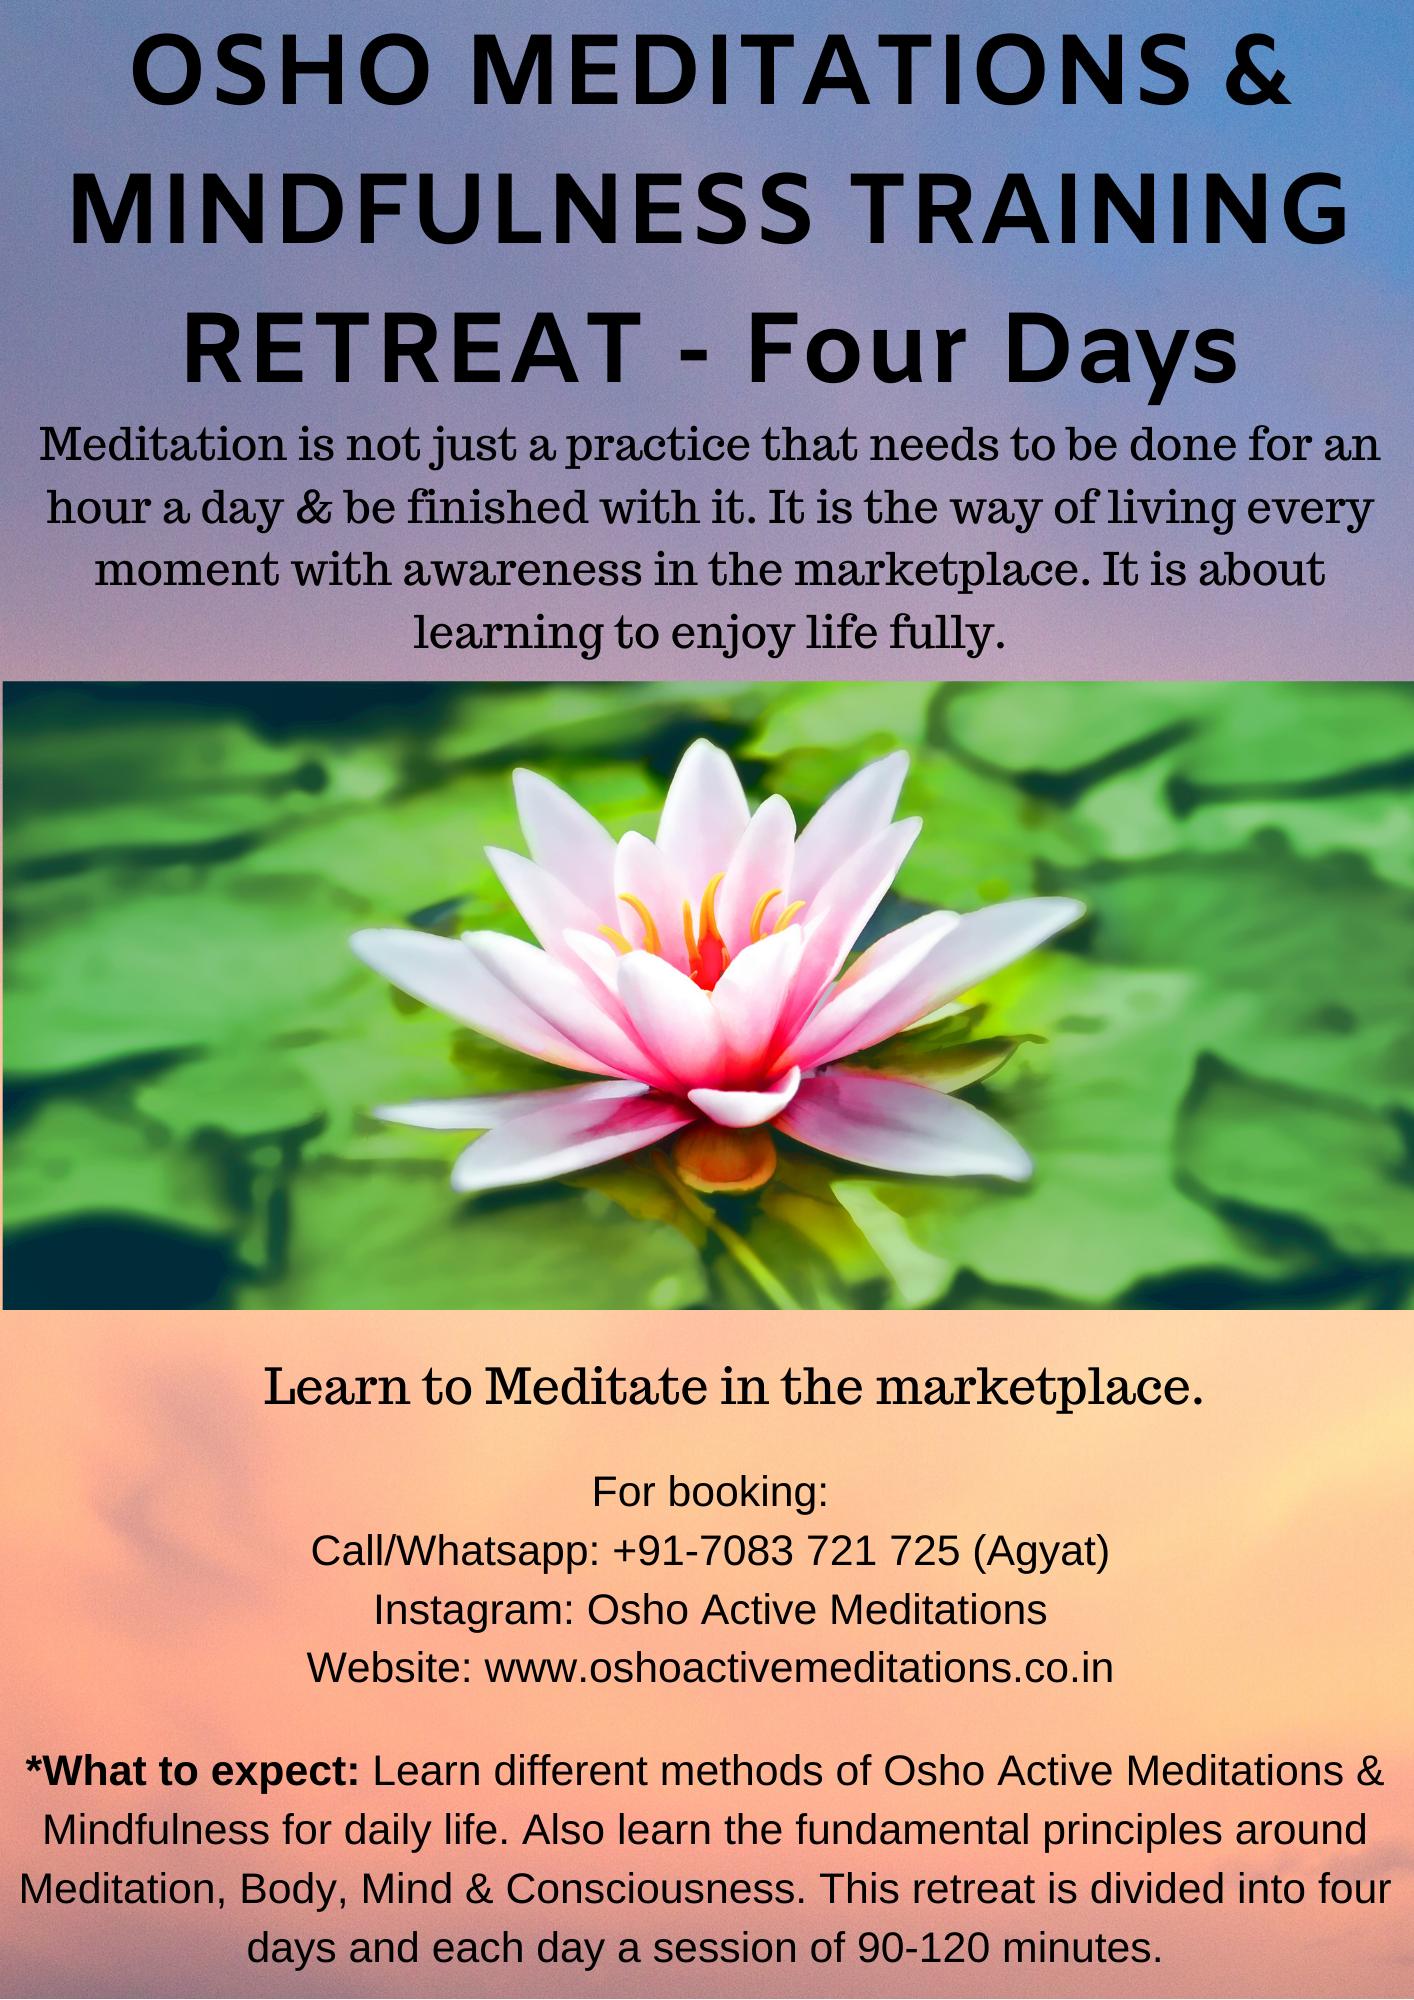 Osho Meditations and Mindfulness Training Retreat - Four days